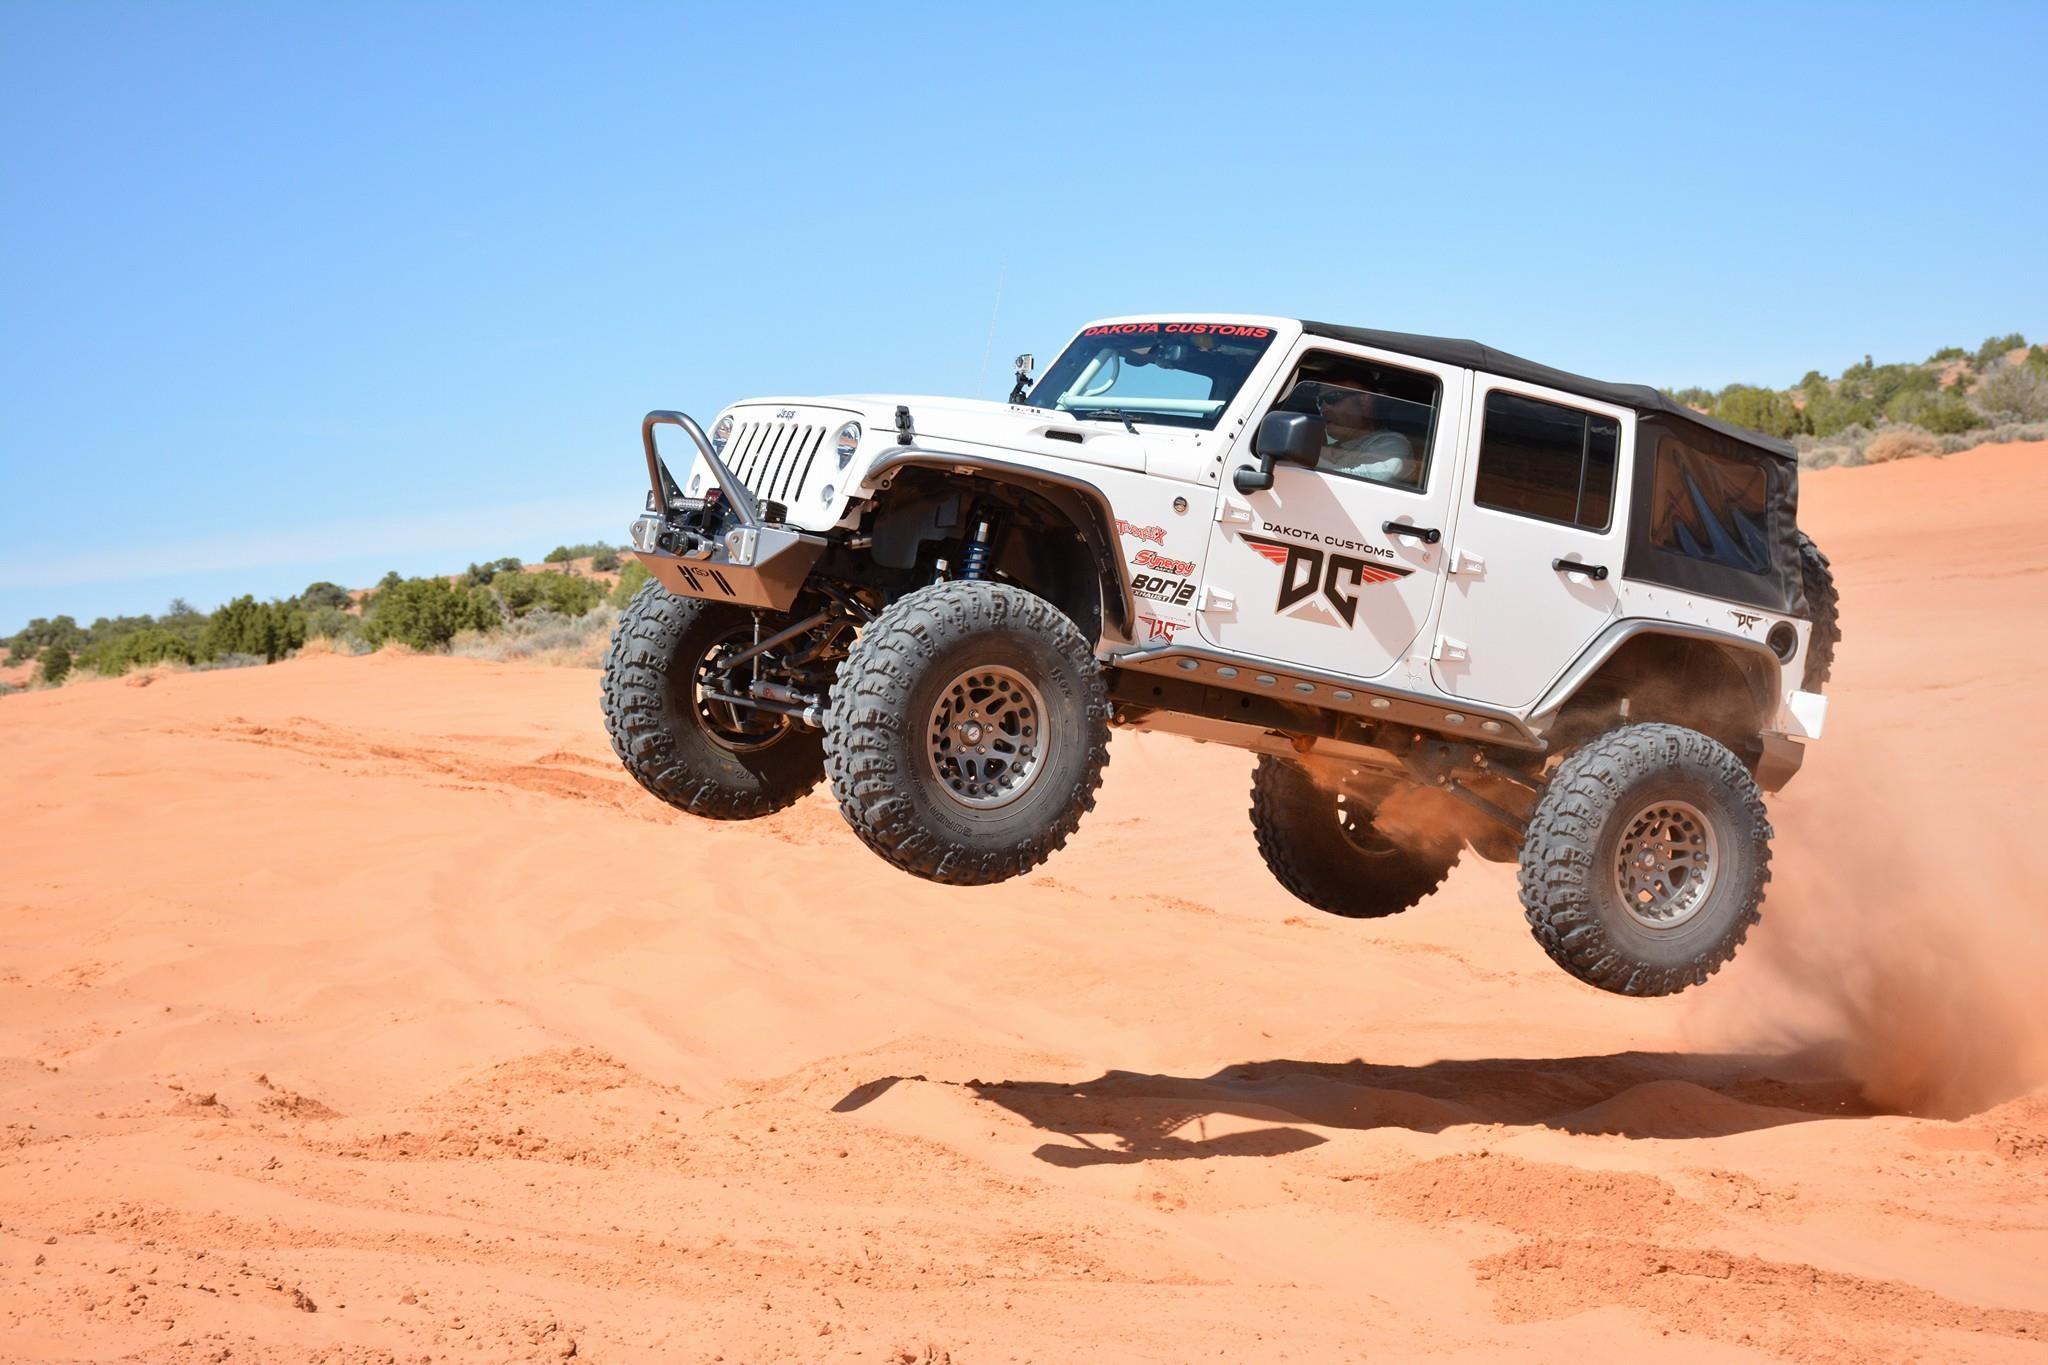 Jeep Wrangler With Hellcat Engine Jeep Wrangler With A Hellcat V8 Engine Swap Depot Jeep Wrangler Jeep Jeep